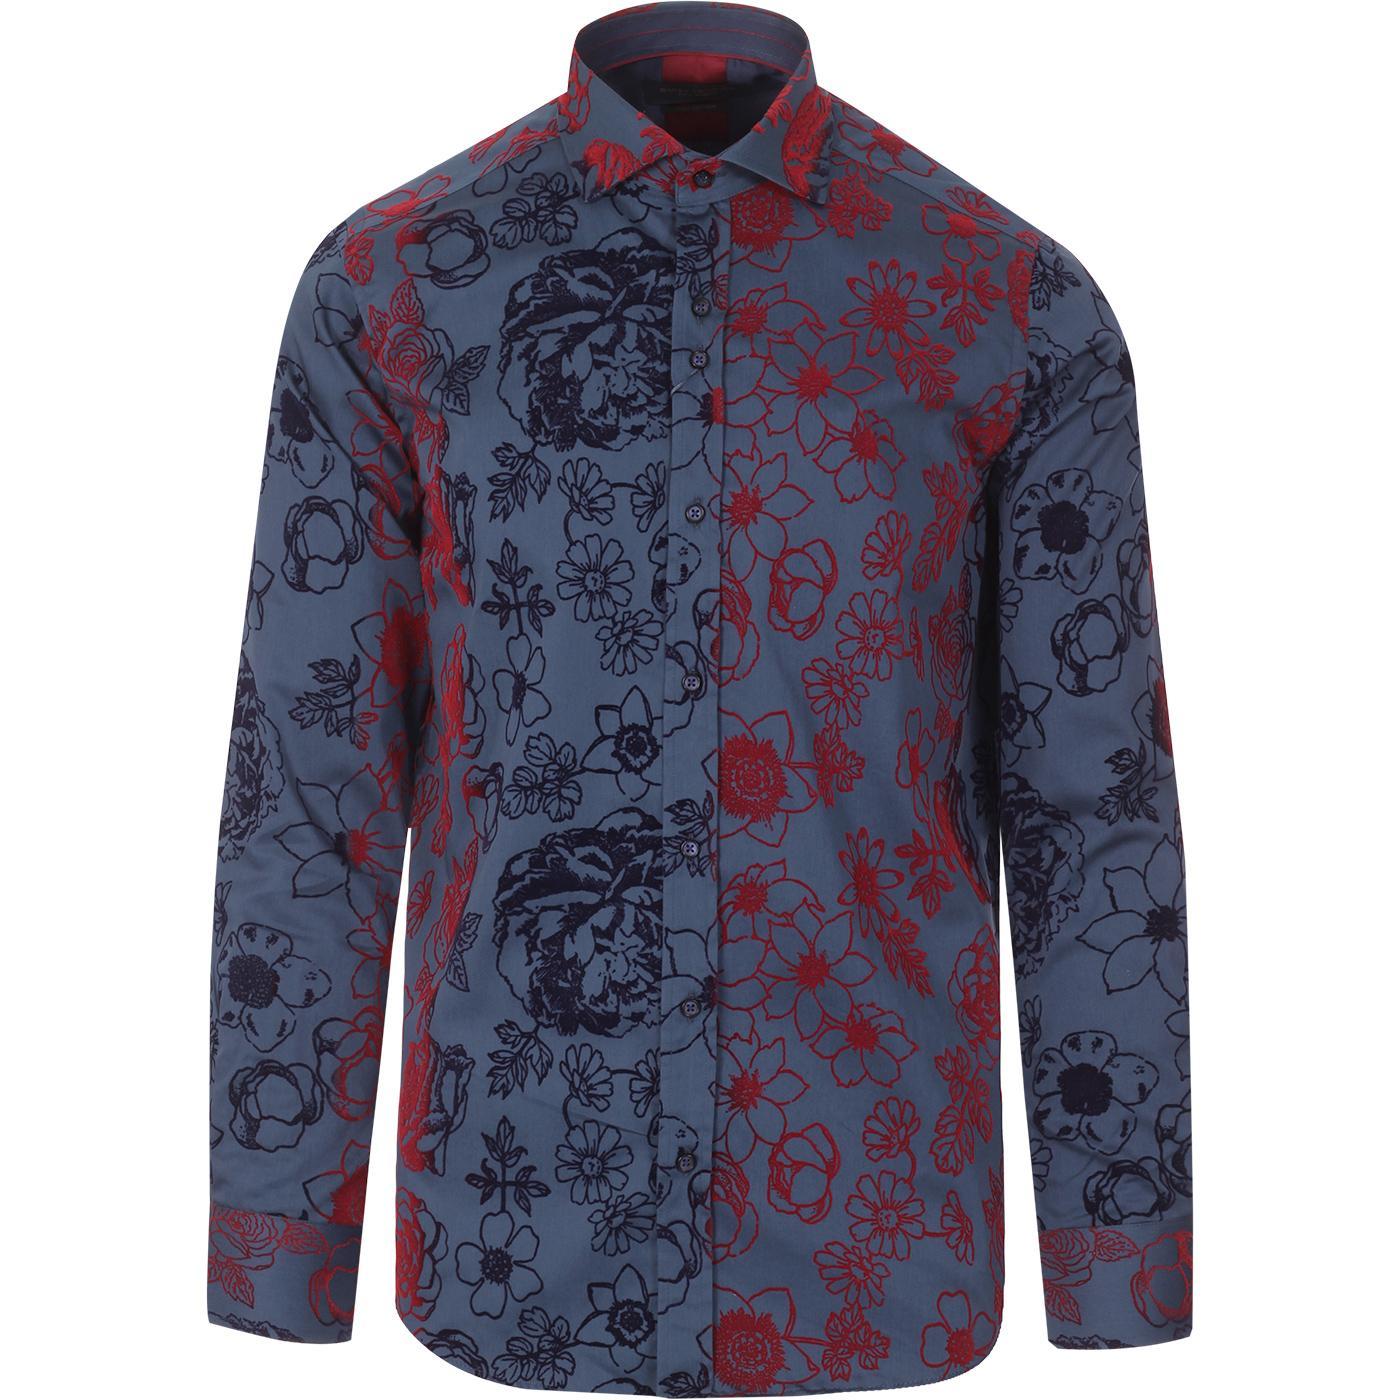 Flock Floral GUIDE LONDON 60s Mod Smart Shirt N/R